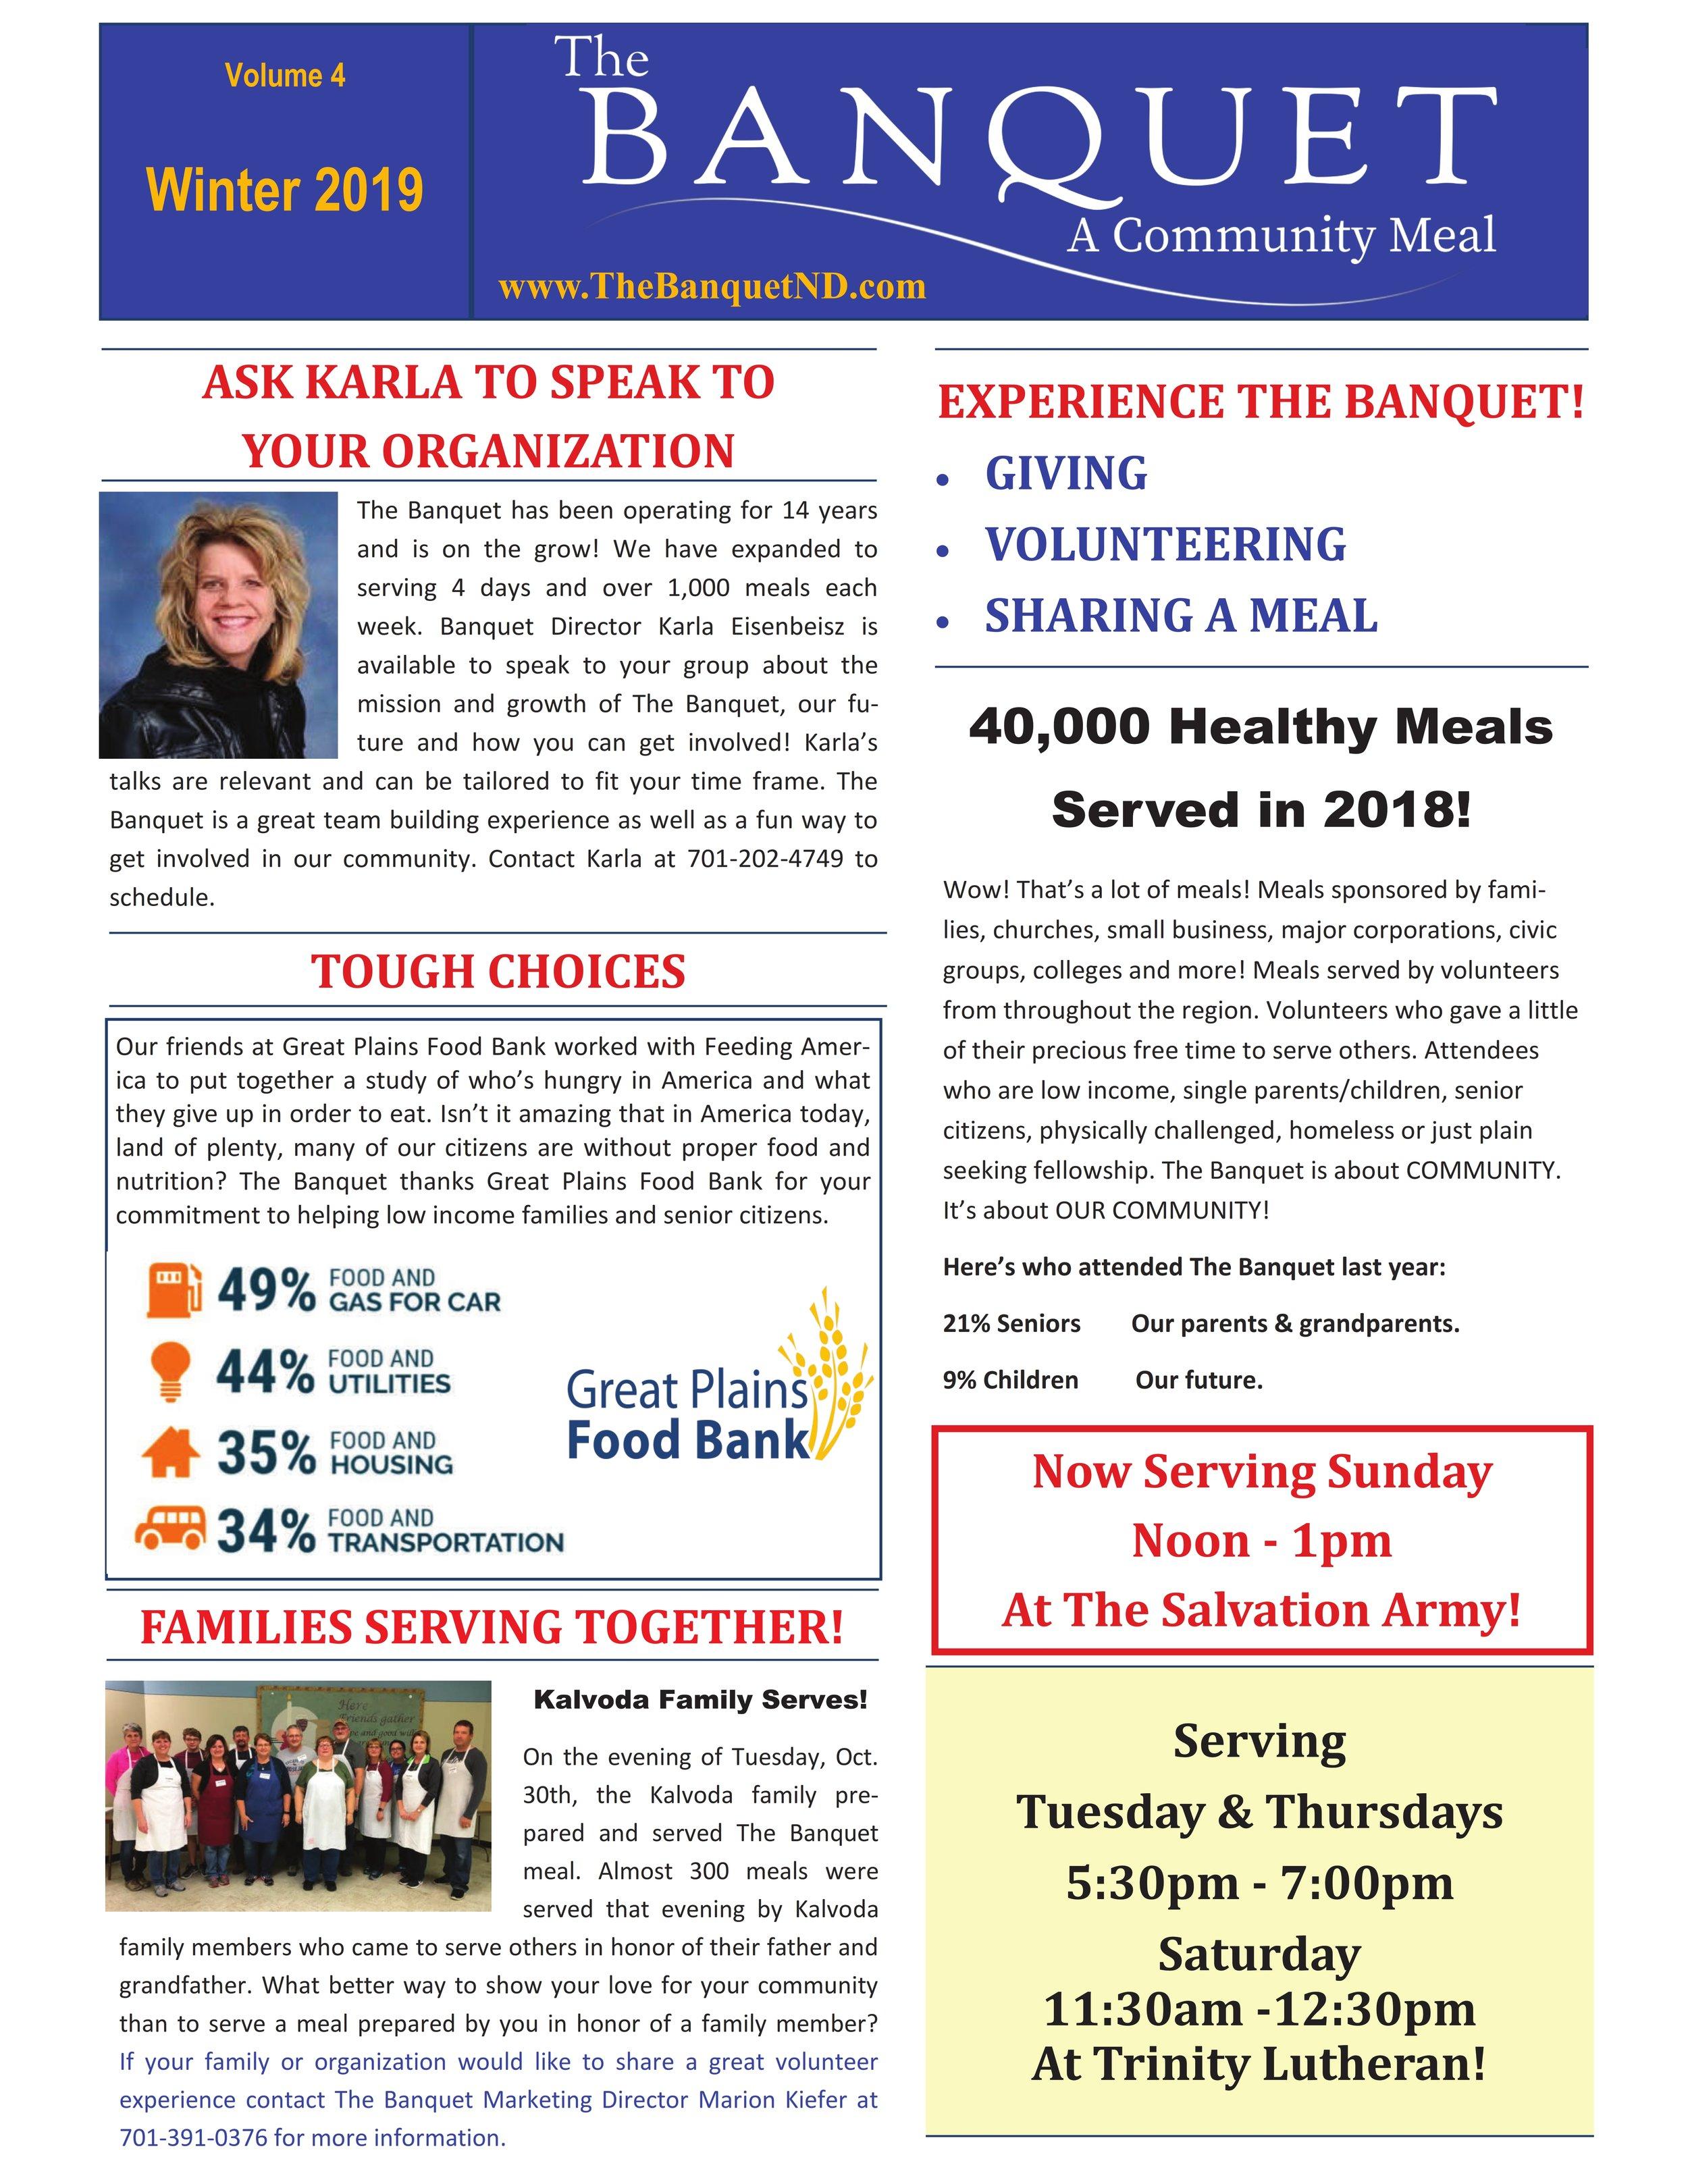 Banquet Newsletter Final Complete-Image Printing-Jan. 22, 2019_001.jpg